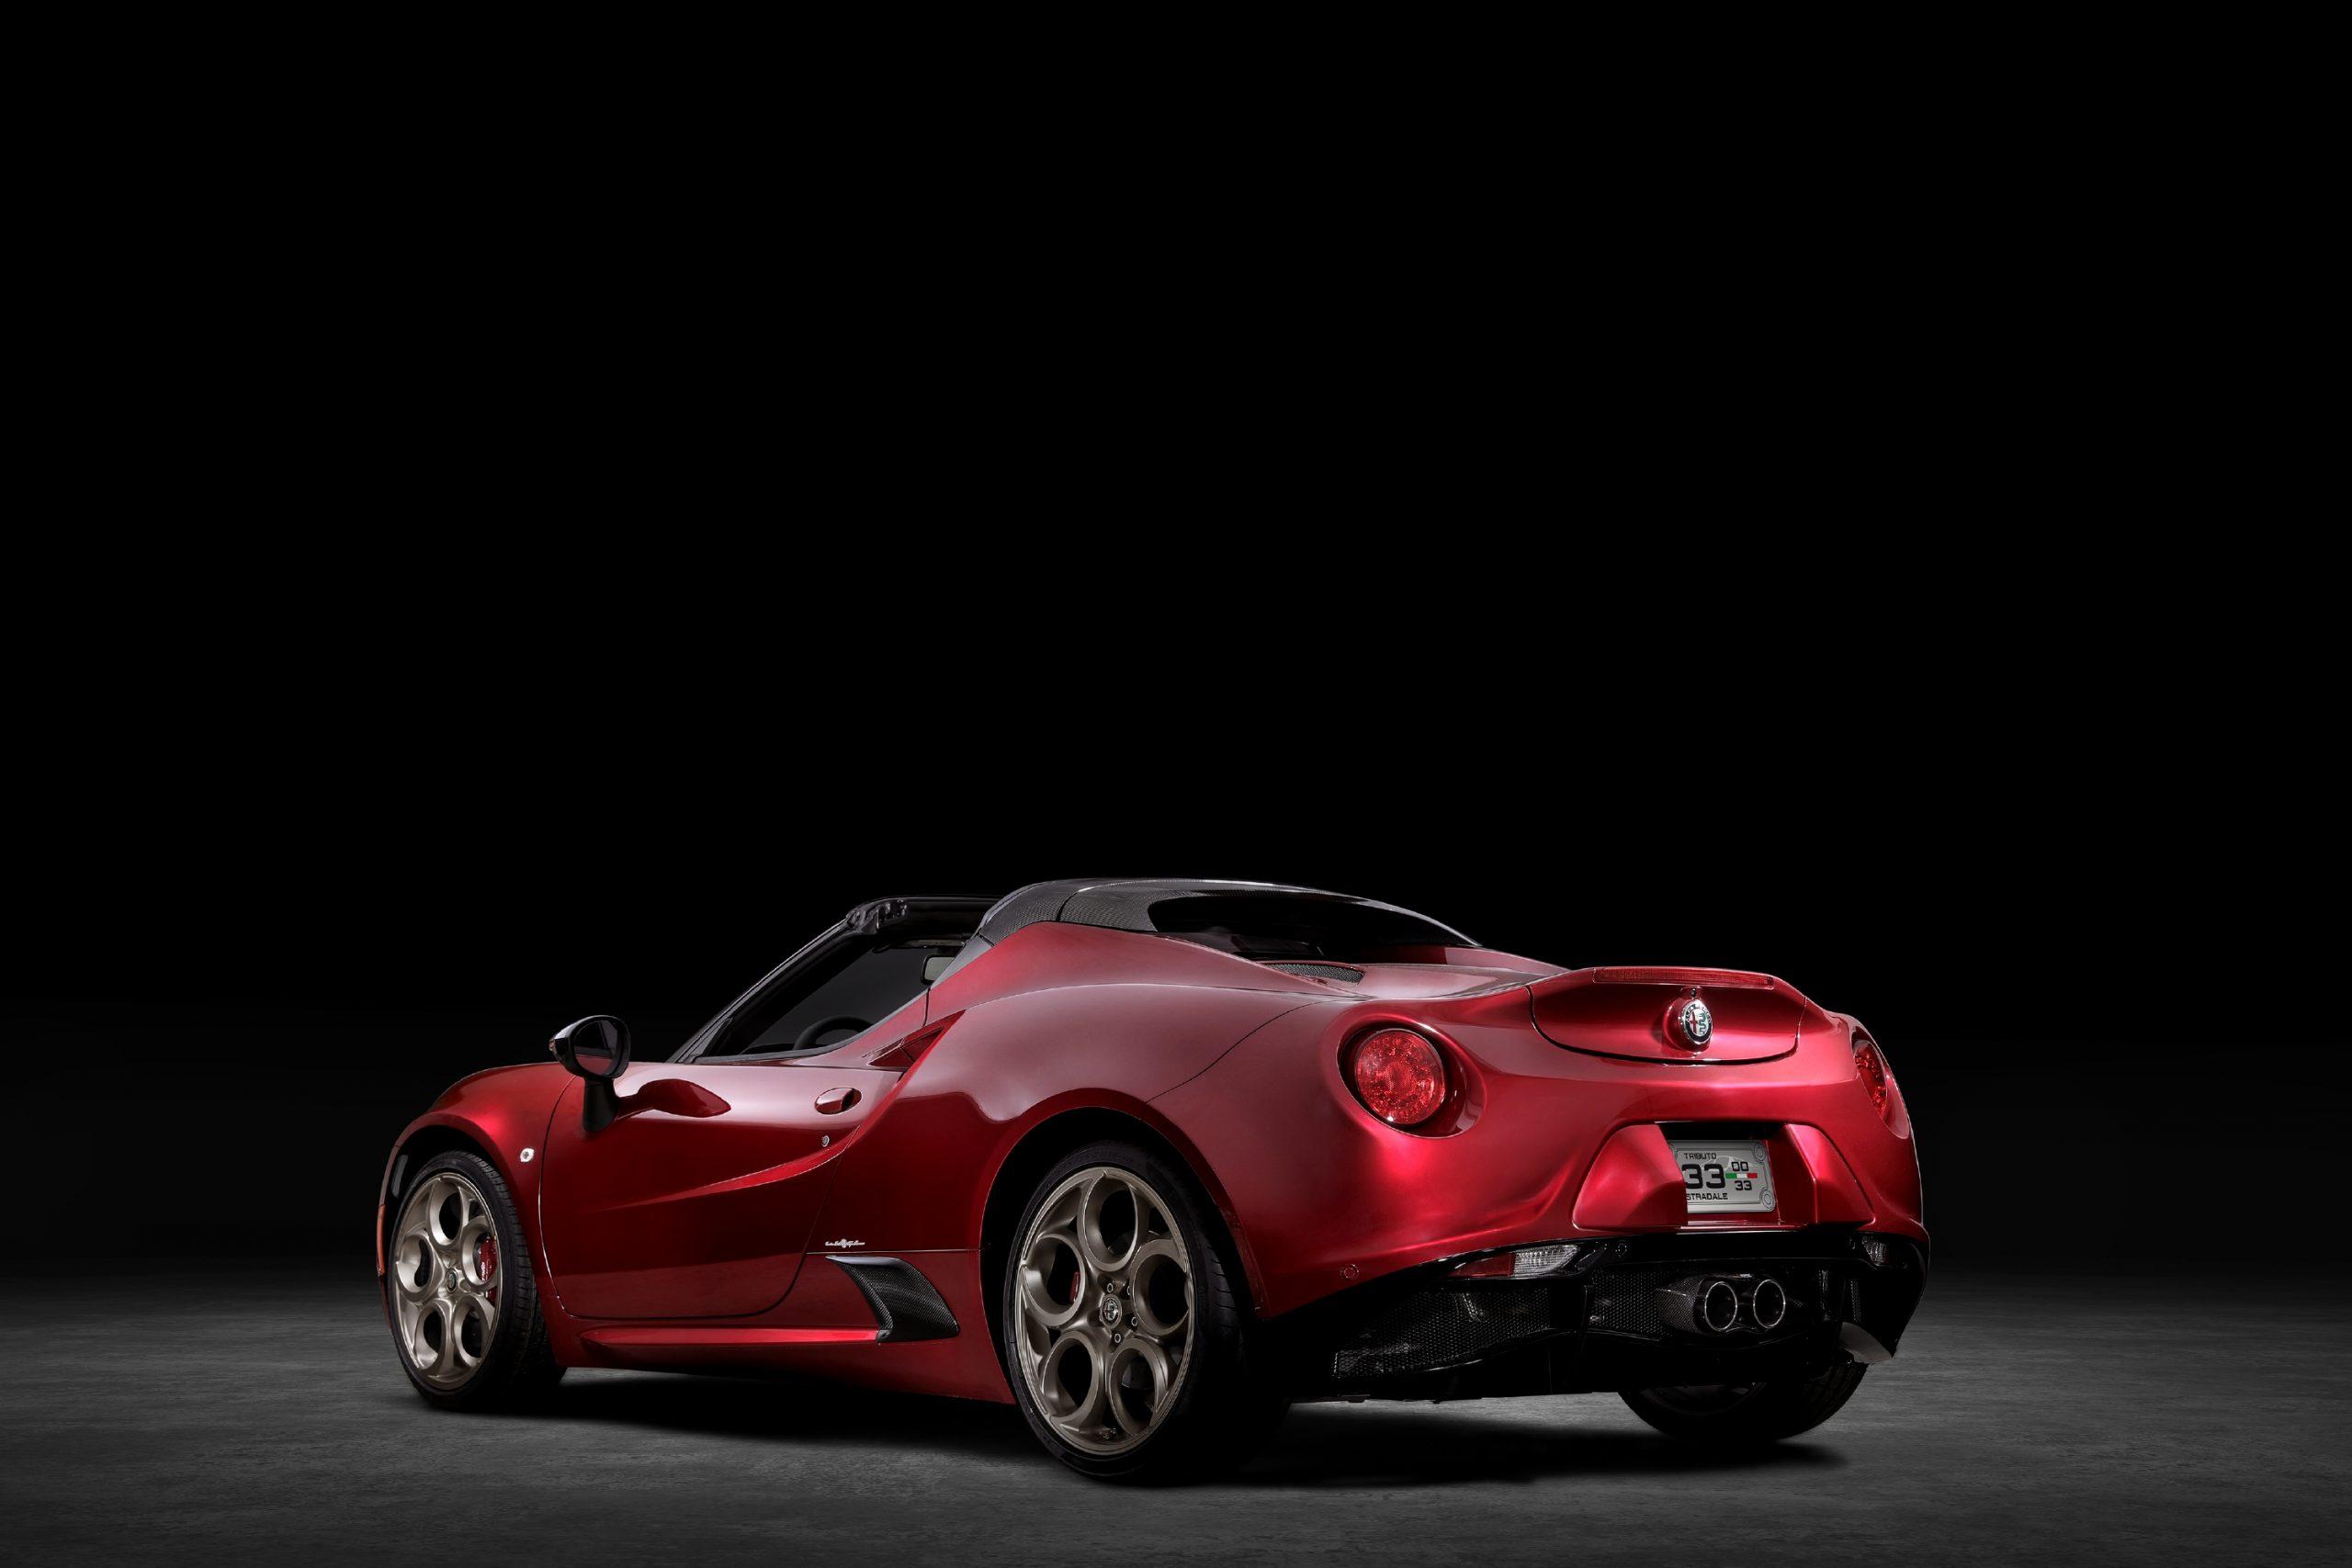 2020 Alfa Romeo 4C Spider 33 Stradale Tributo rear three quarter